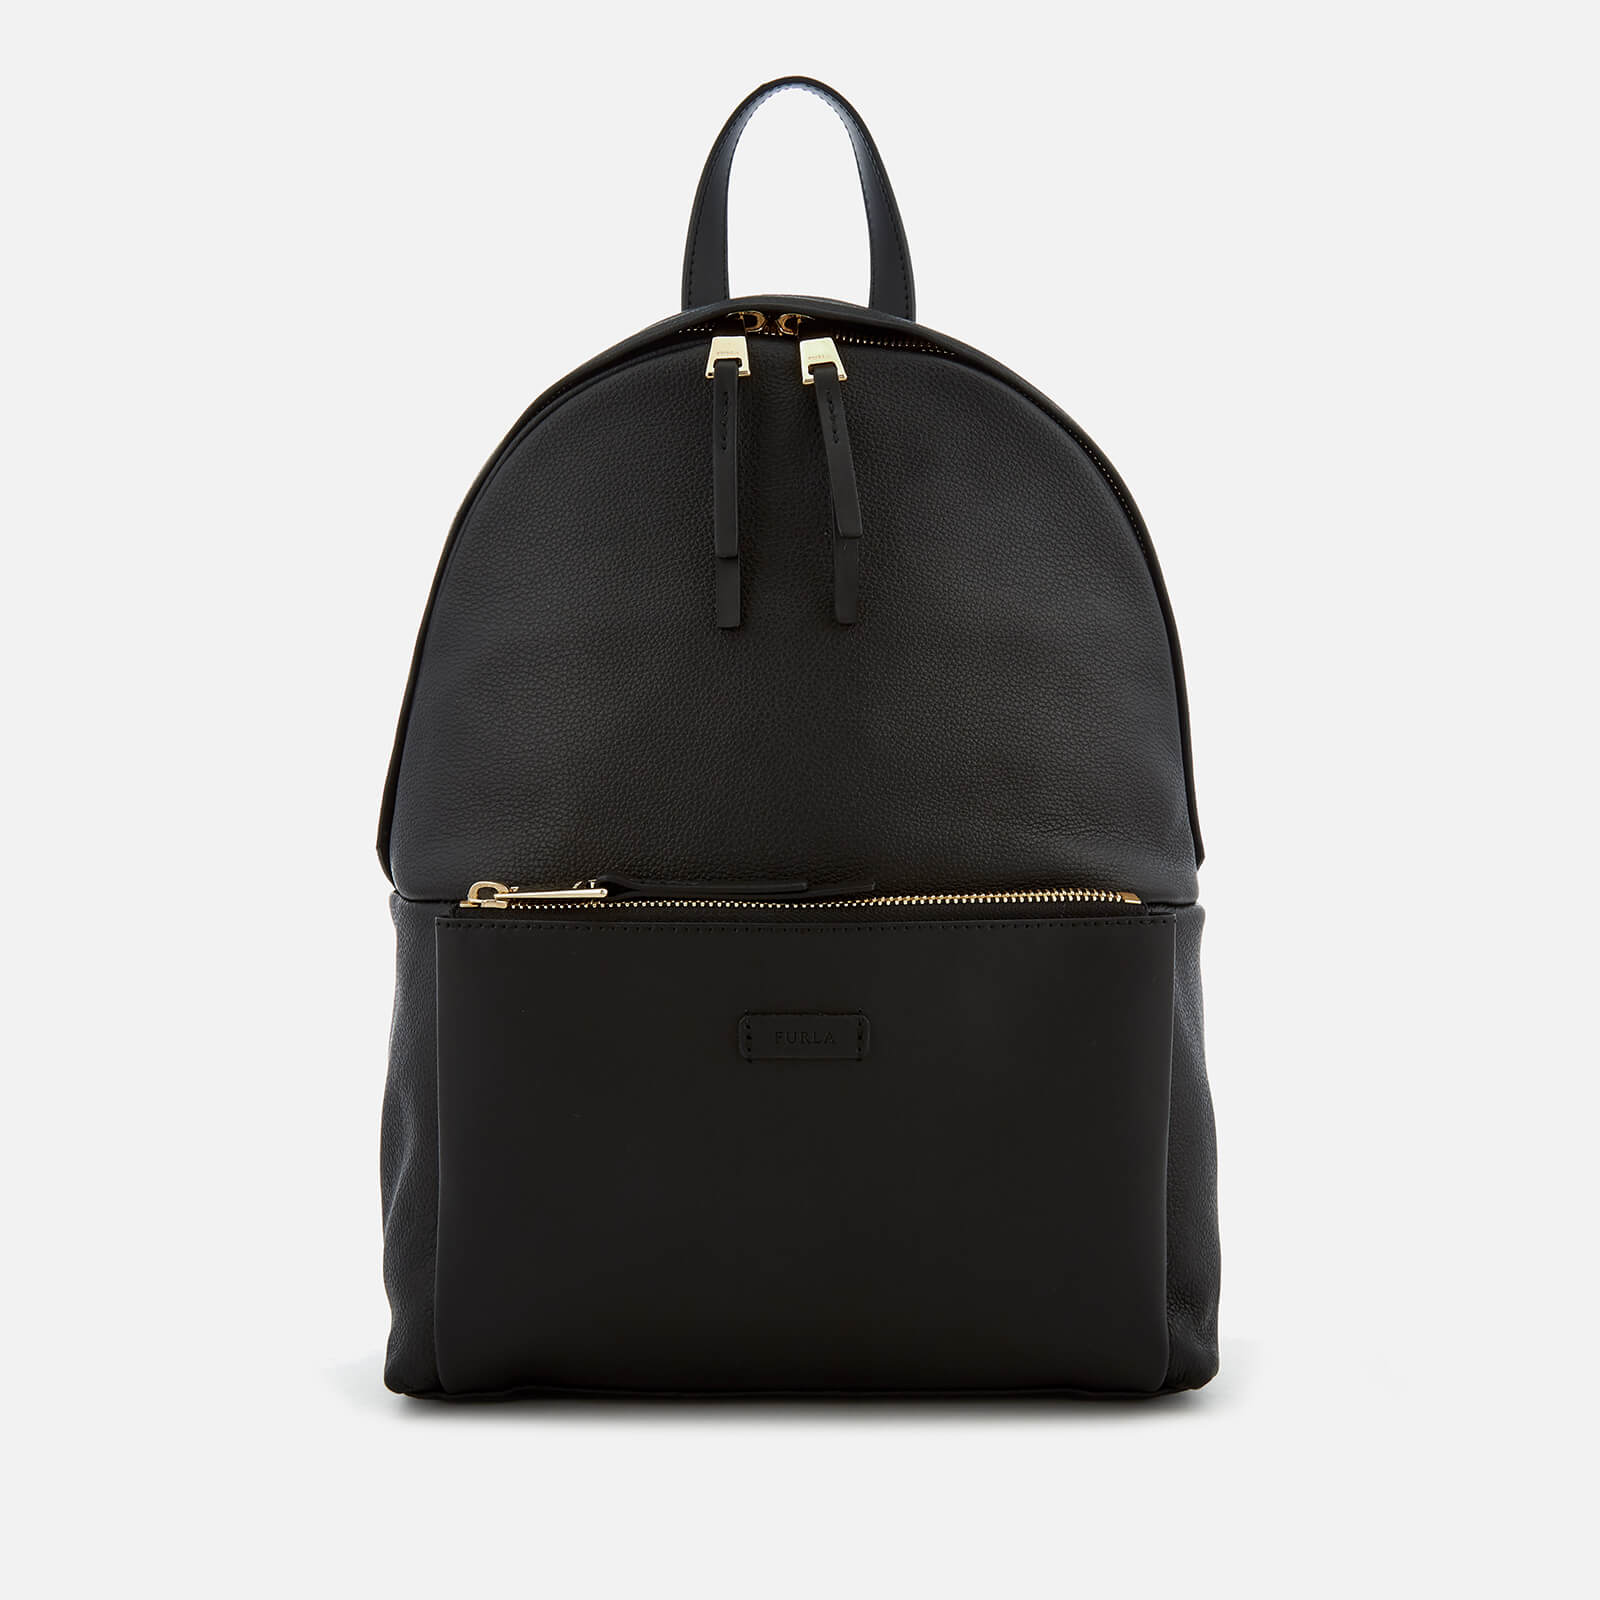 f331965fbe04 Furla Women's Giudecca Small Backpack - Black